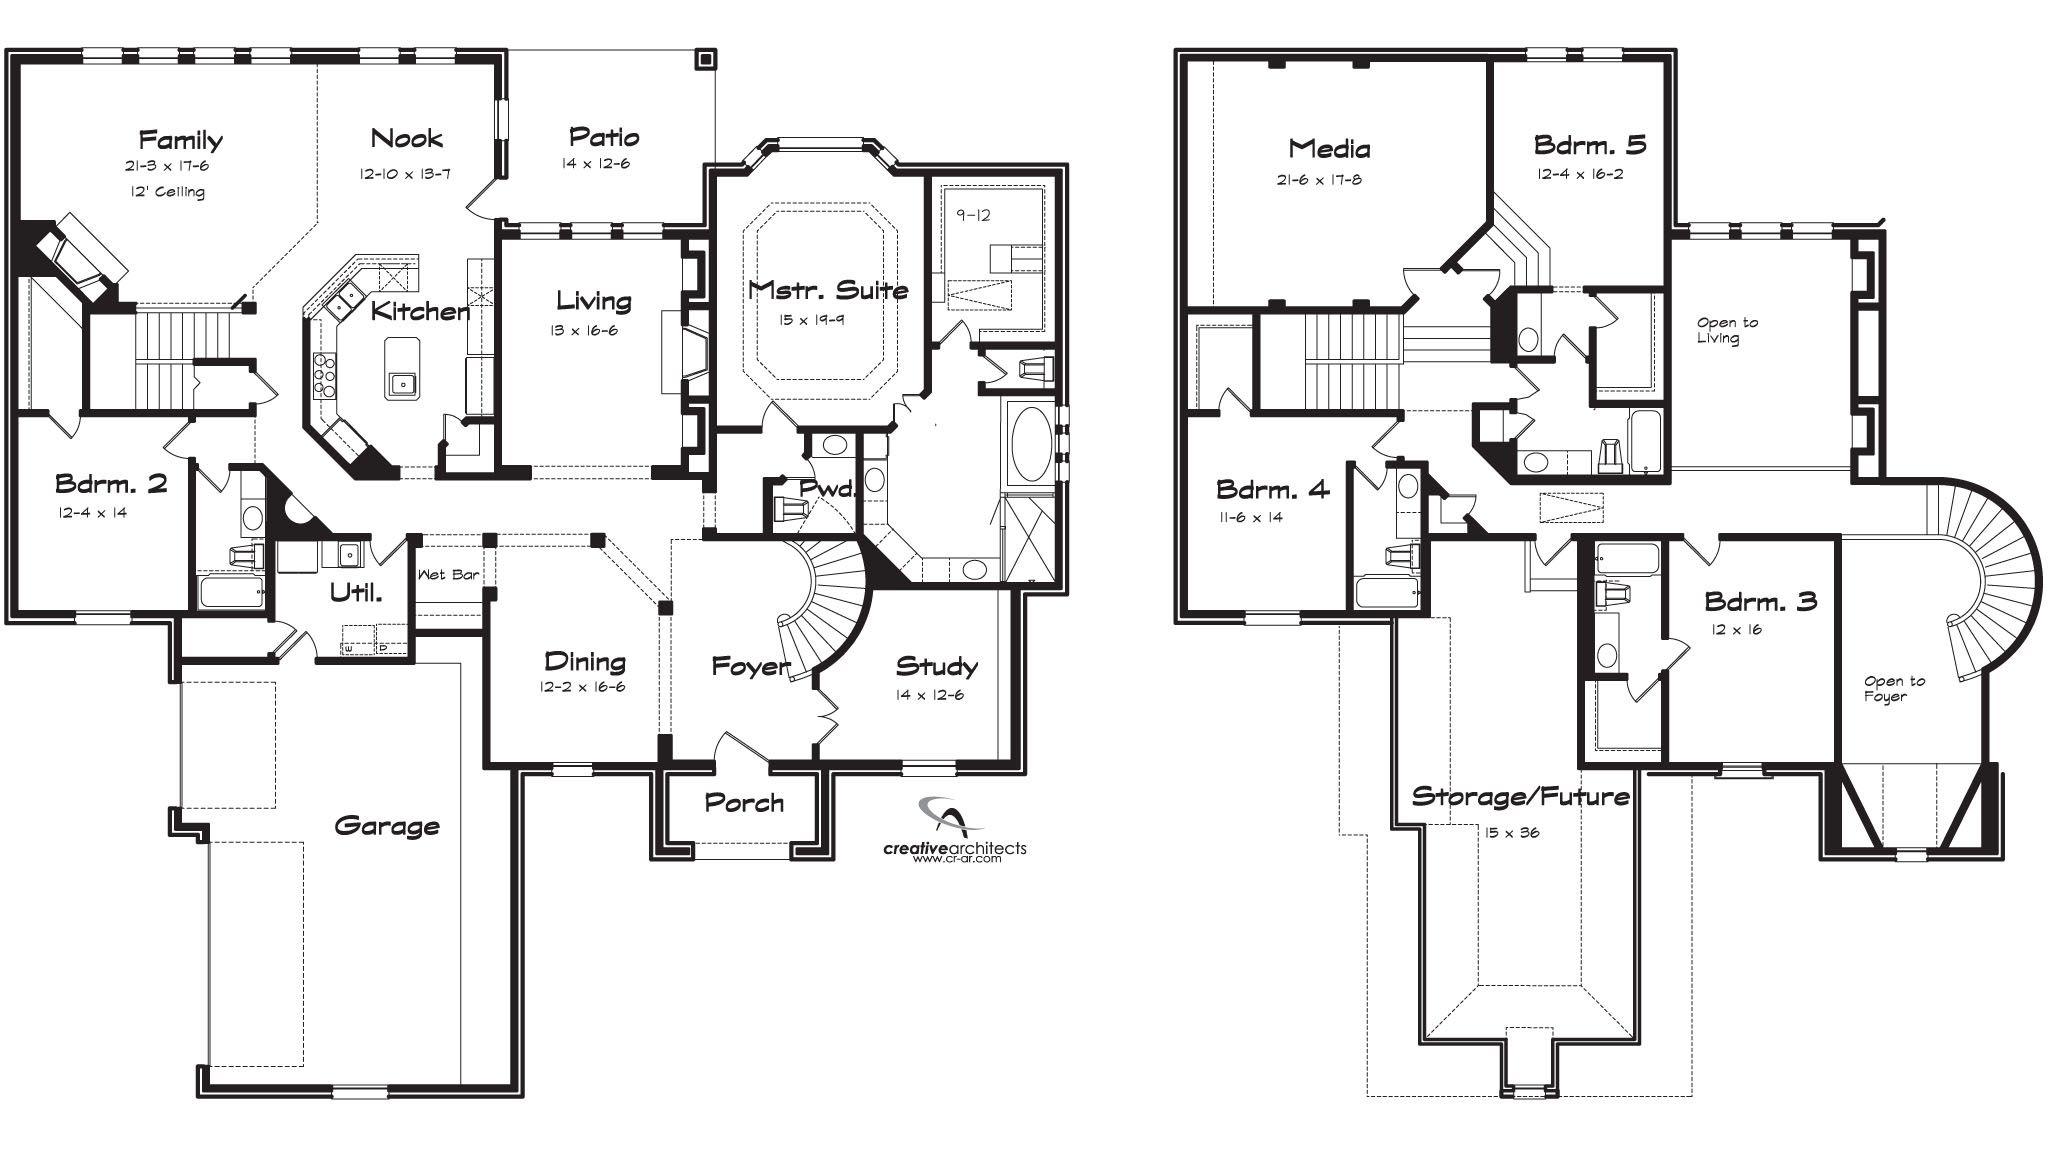 Pin by Ashley Alydane on Floorplans | Pool house plans ...